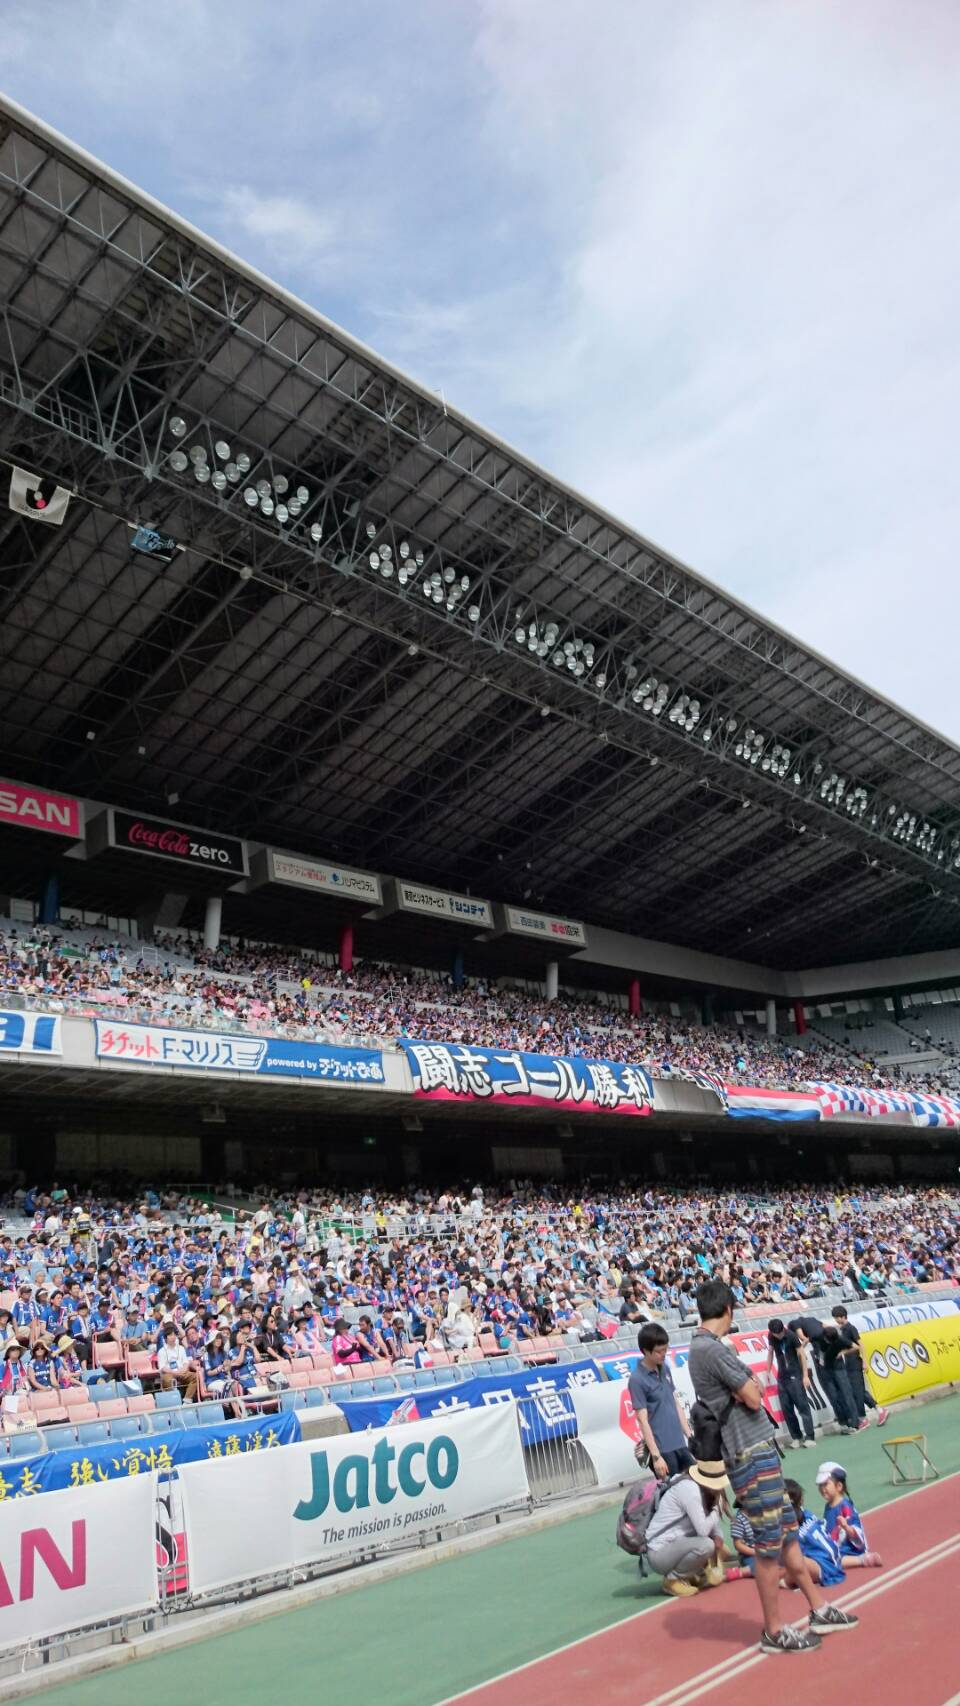 6/11 U-8 Jリーグ観戦